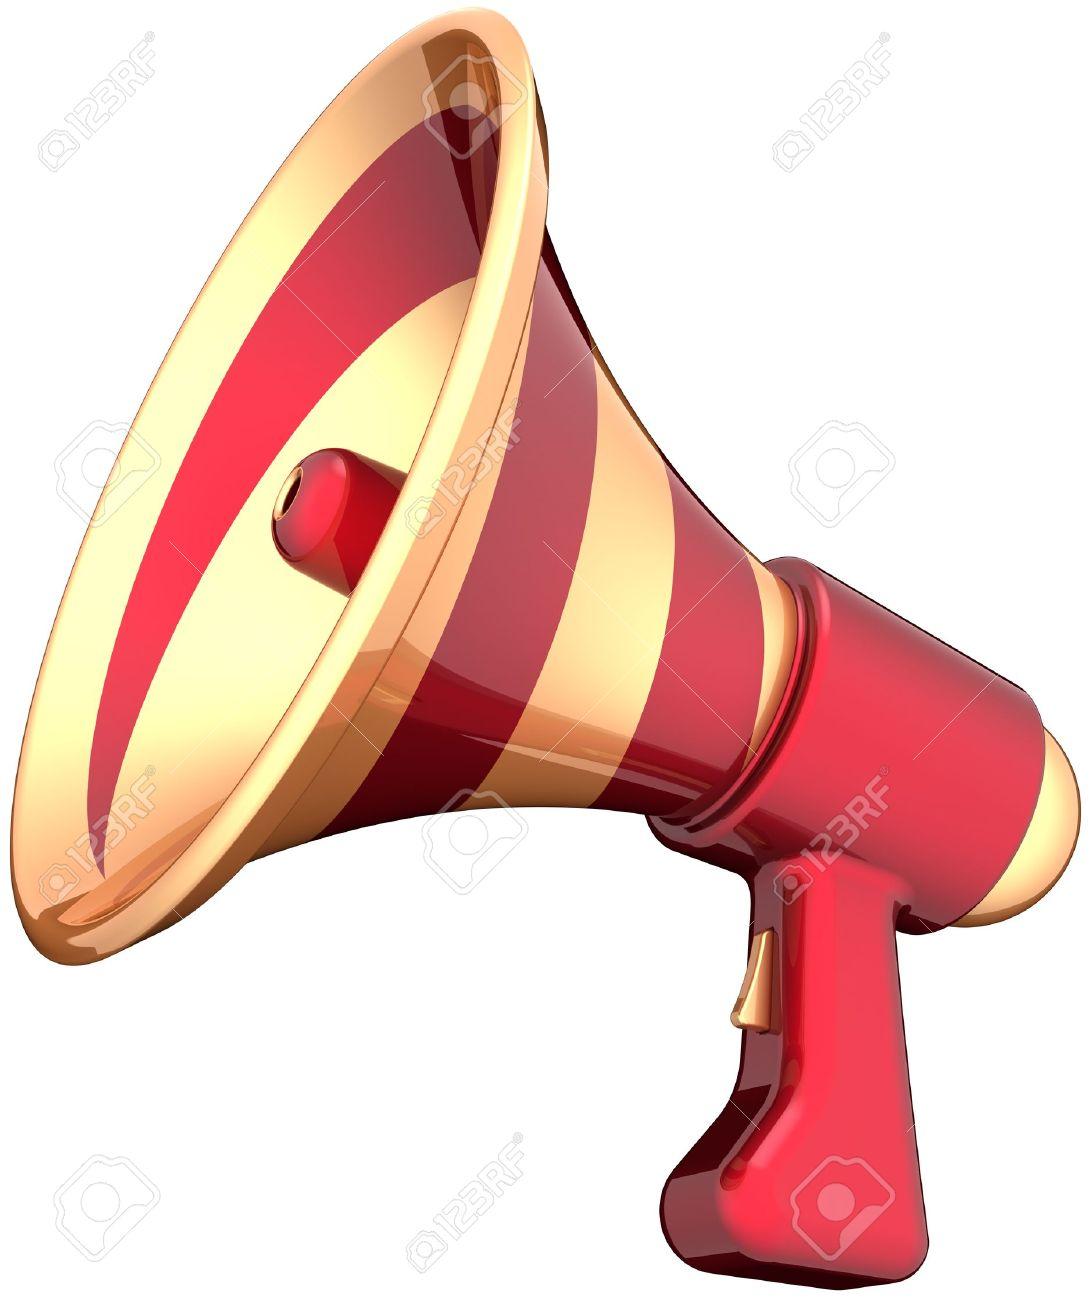 Advertising clipart megaphone. Notice public announcement pencil